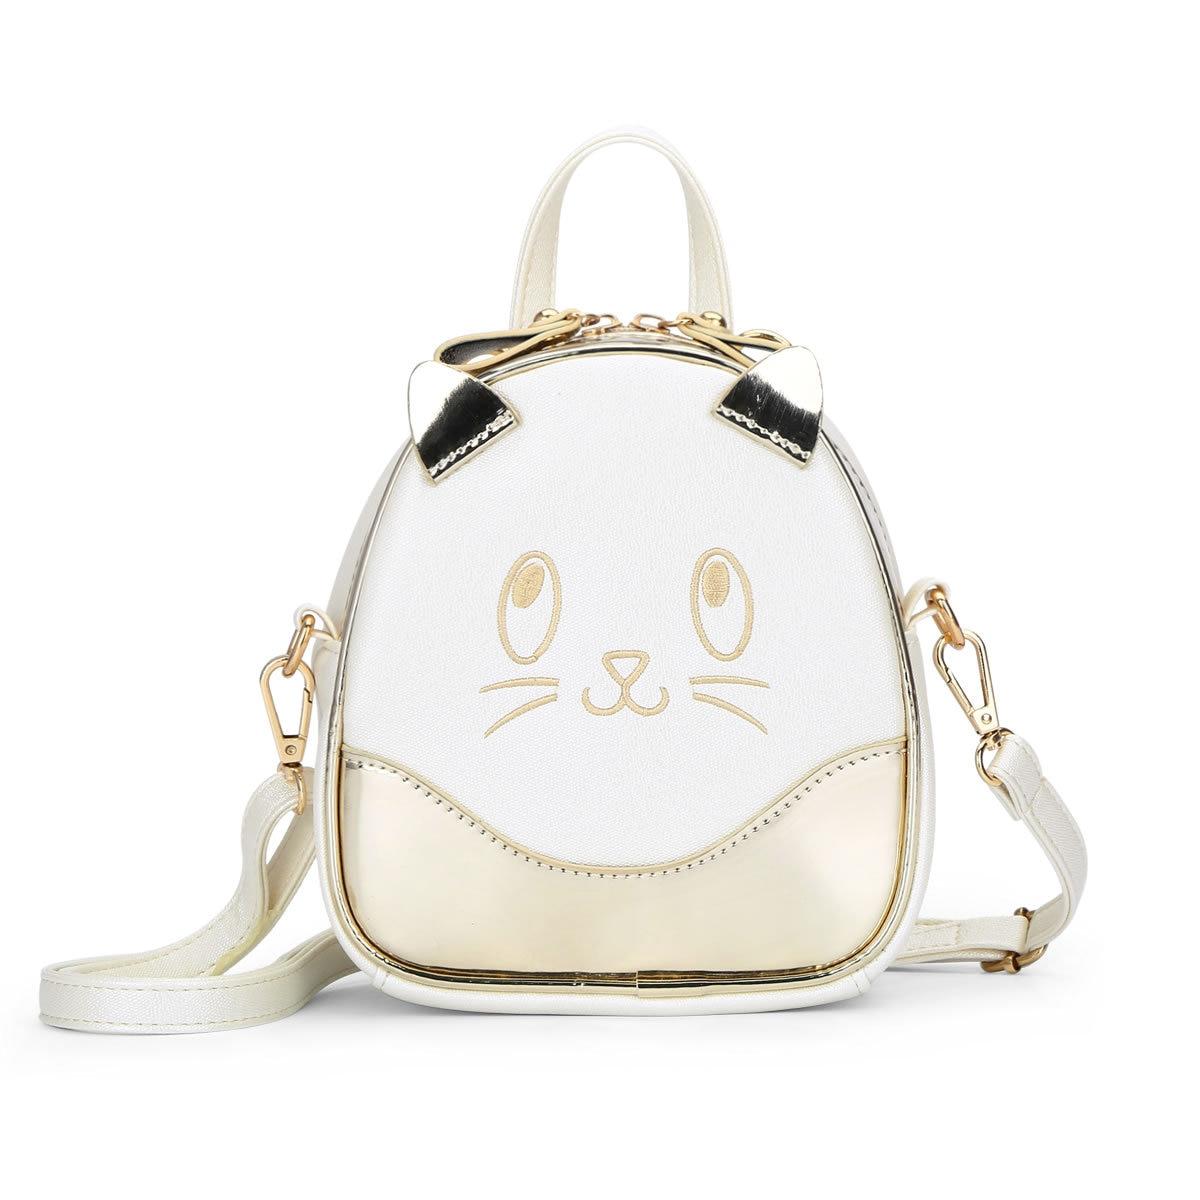 Aliexpress Mini Women Backpack Small Fashion Rucksack Hot Ping Purse Las Joker Bookbag Travel Bag Student School Backpacks From